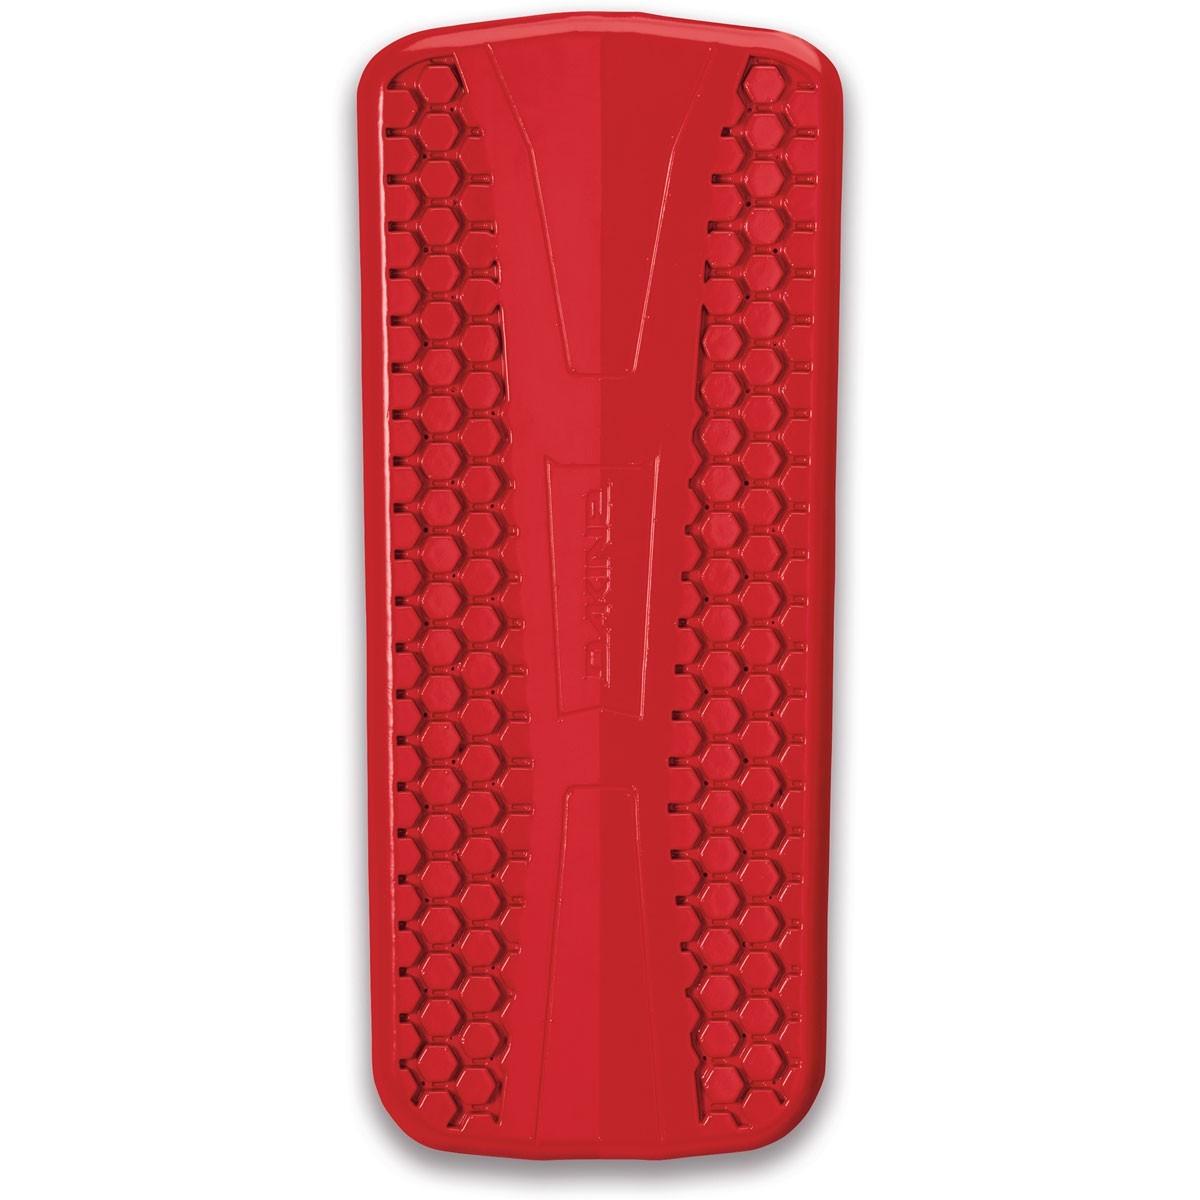 Dakine Poacher RAS Защита для спины Dakine IMPACT SPINE PROTECTOR RED DKIMPACTSPINEPROTECTOR-RED-610934109689_10000949_RED-71M_MAIN.jpg